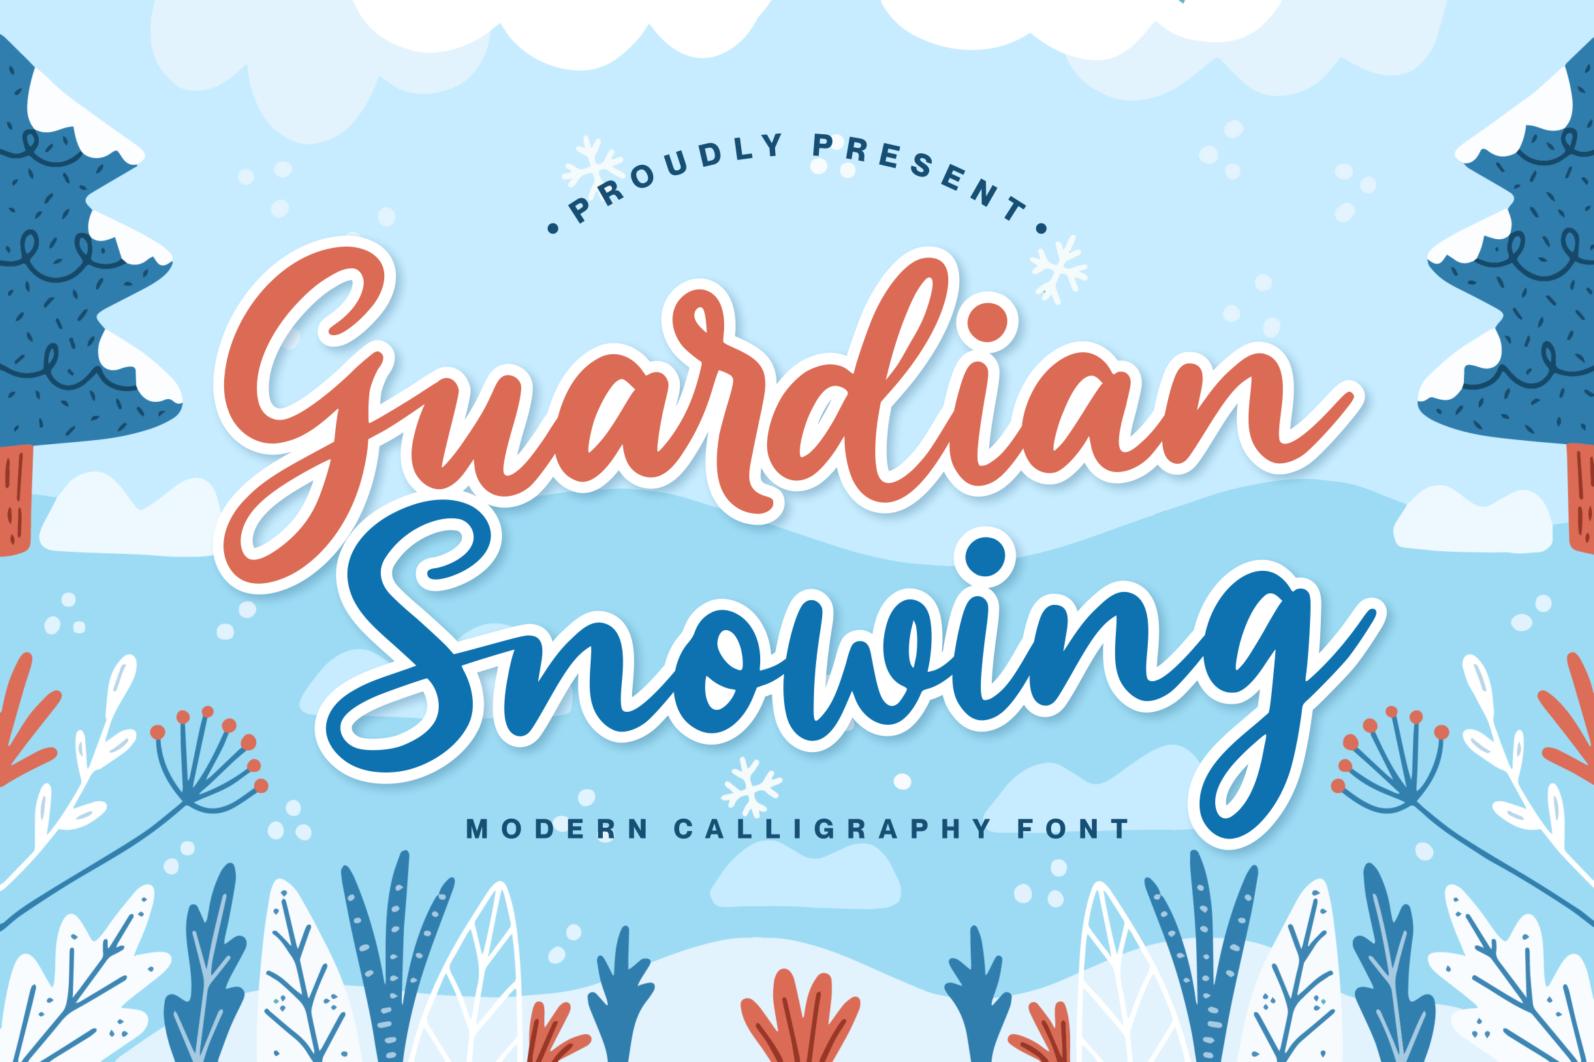 Guardian Snowing - 1 55 -